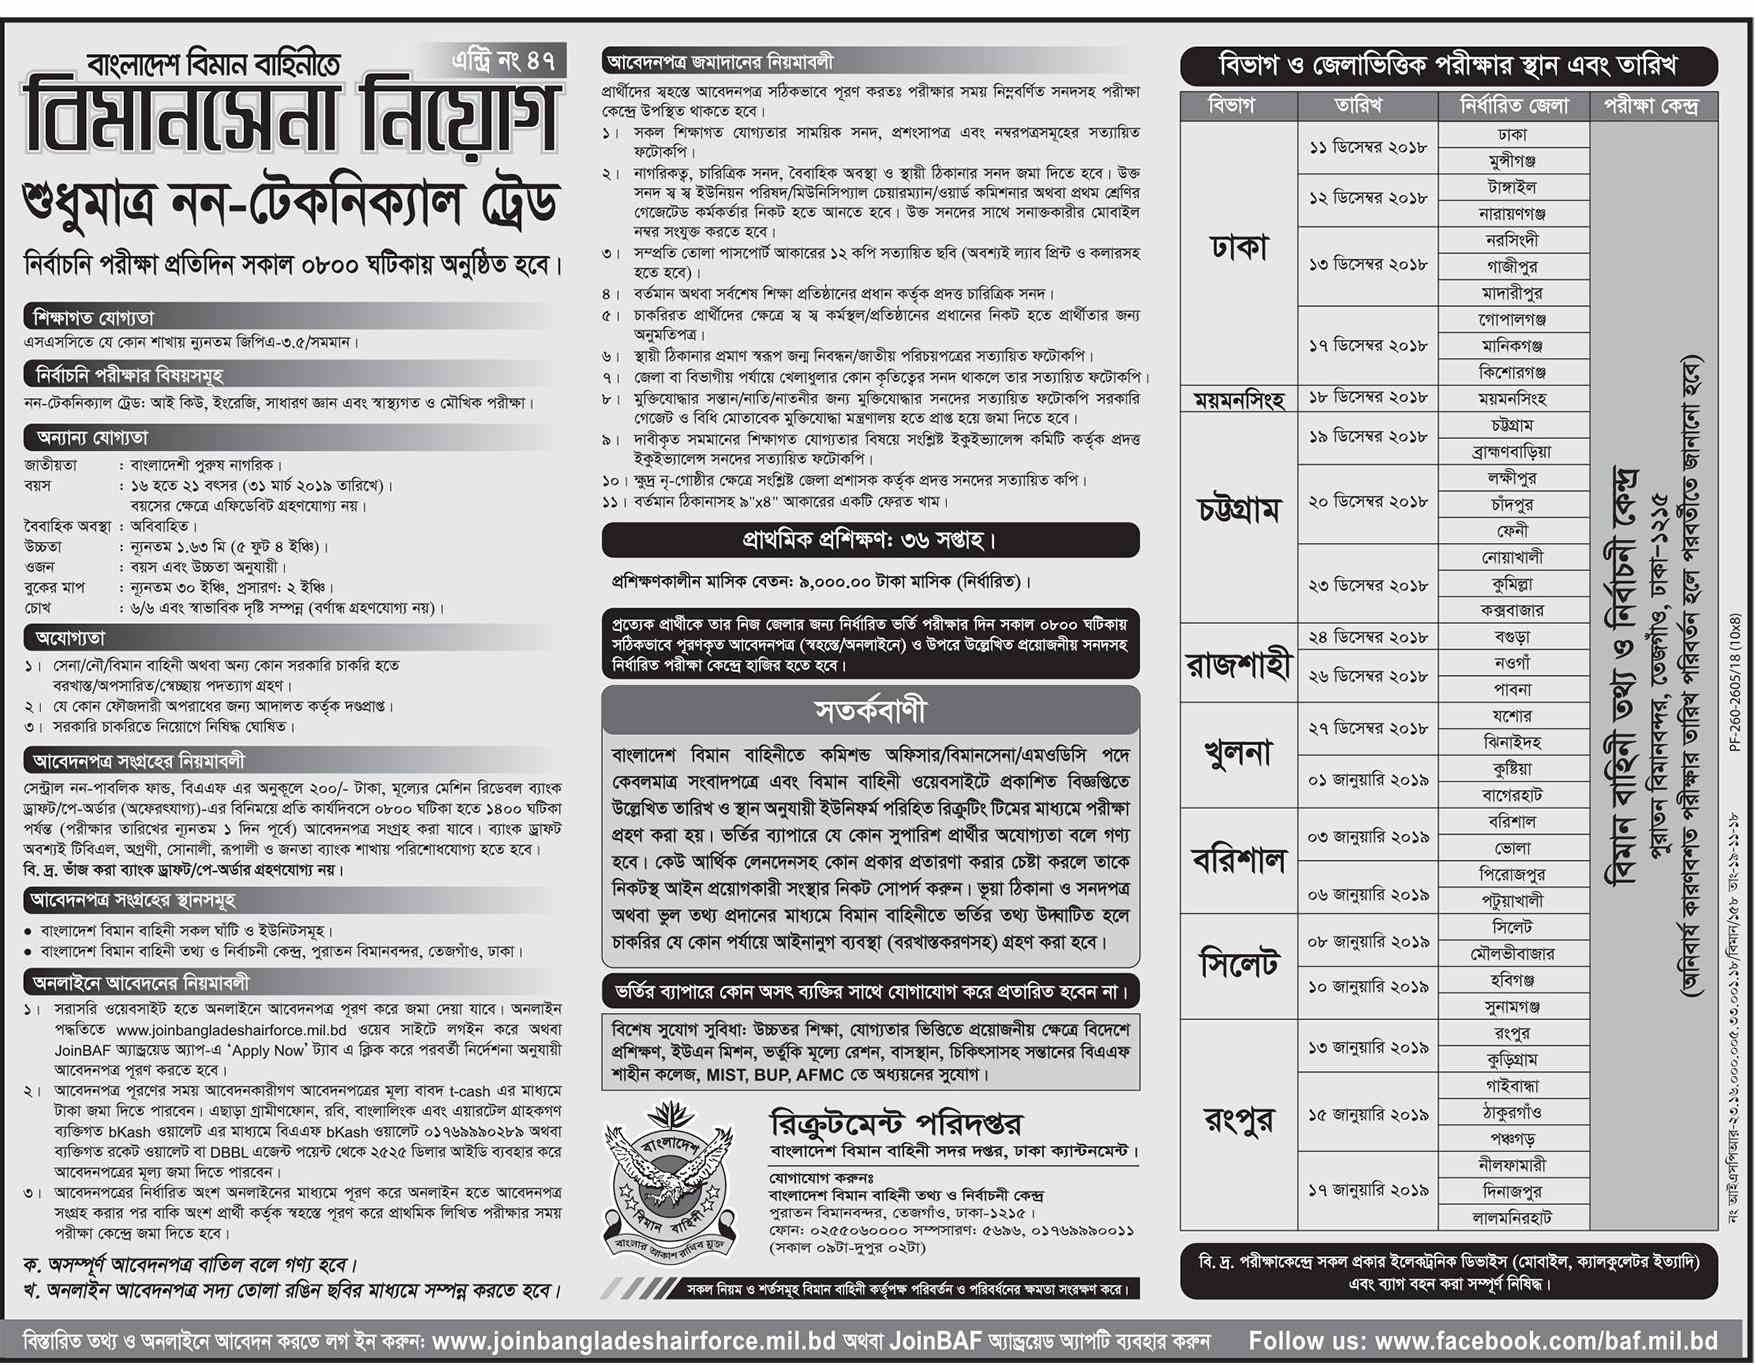 Bangladesh Air Force job circular 2018